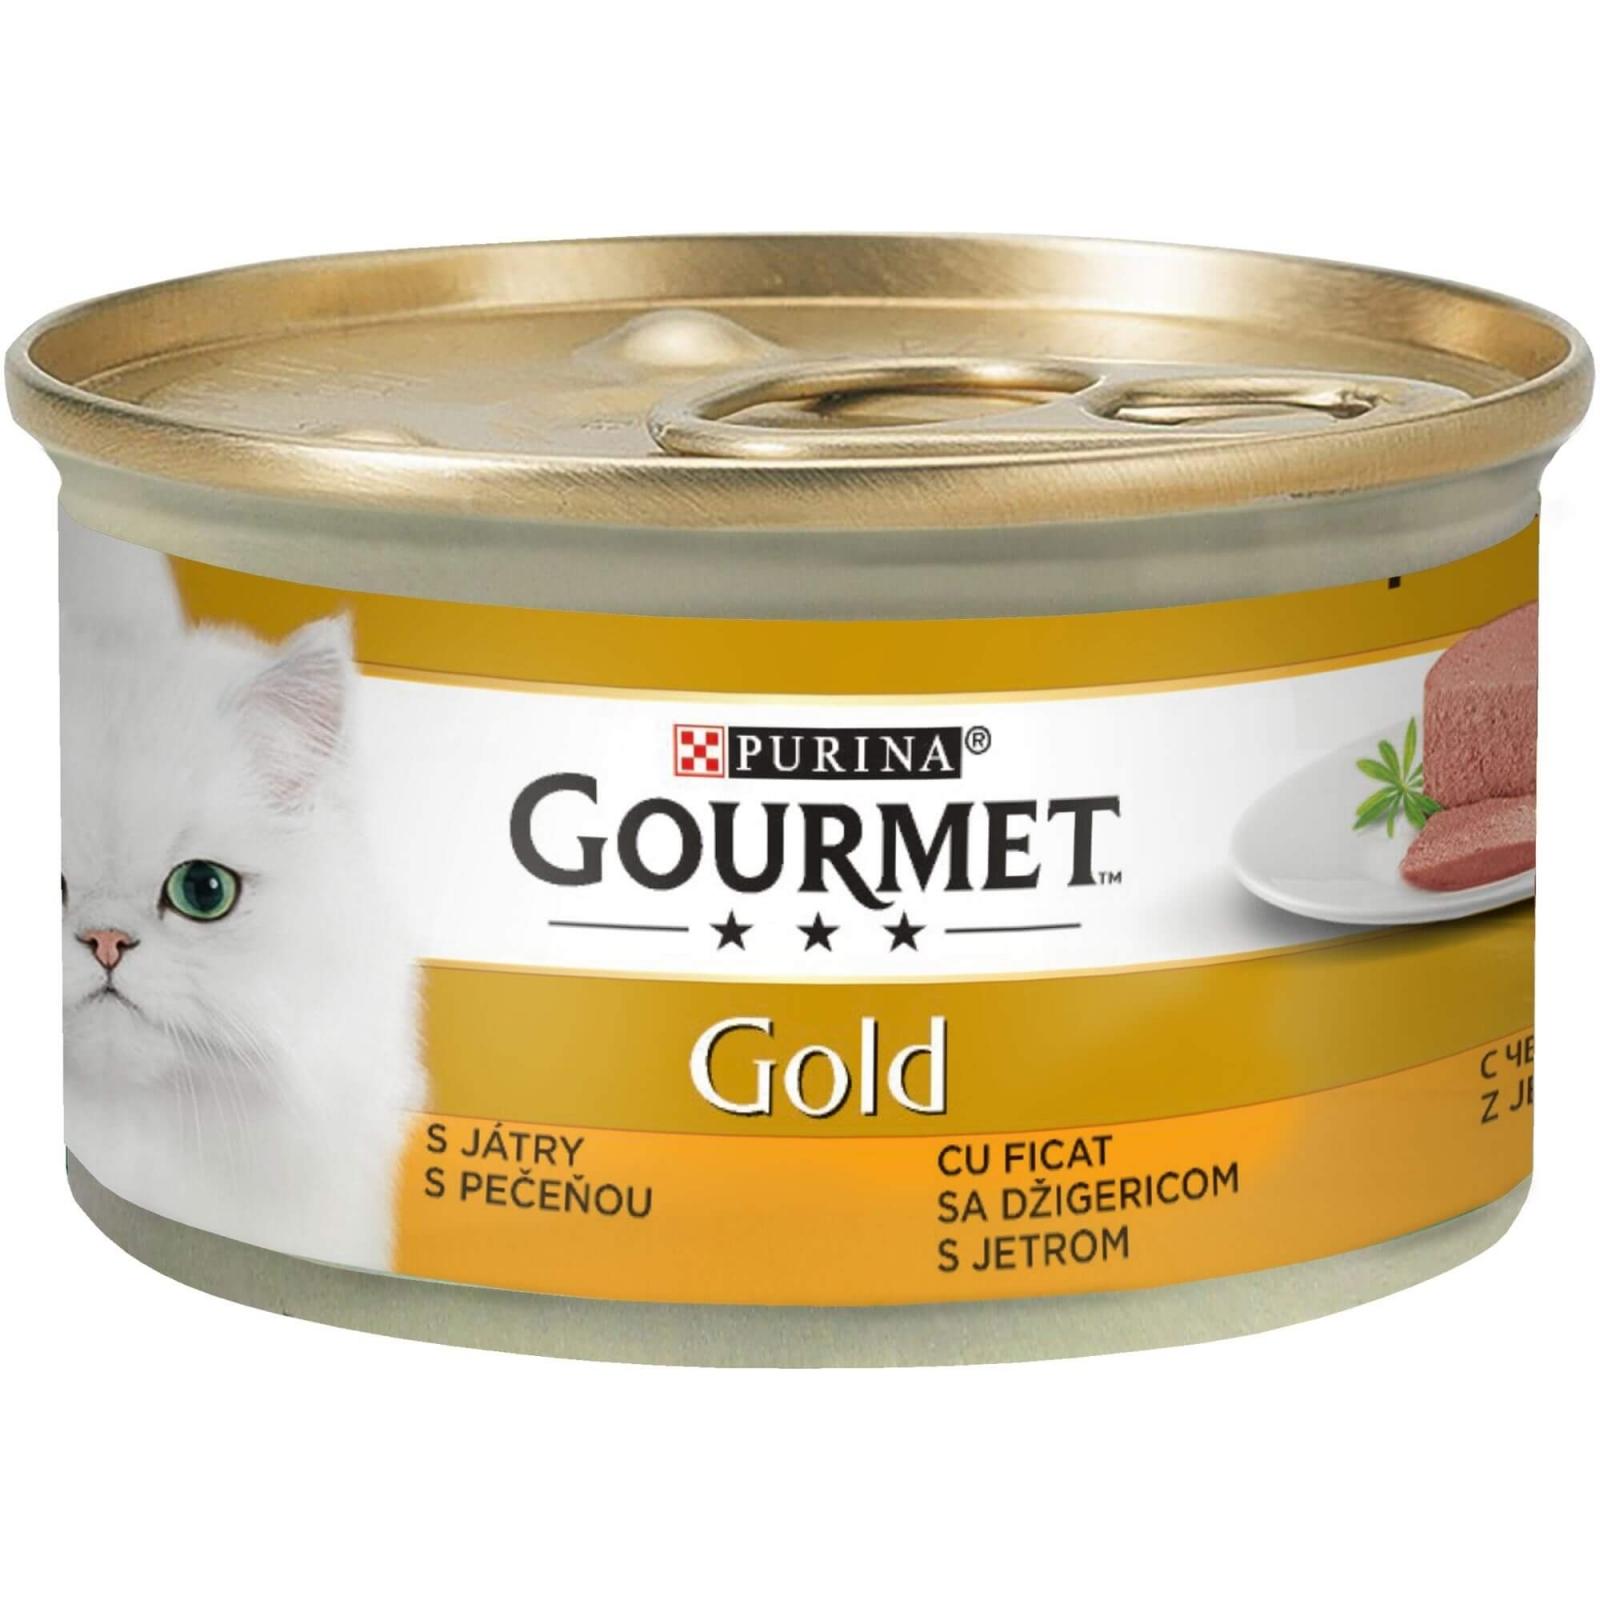 Gourmet Gold Mousse cu Ficat, 85 g imagine